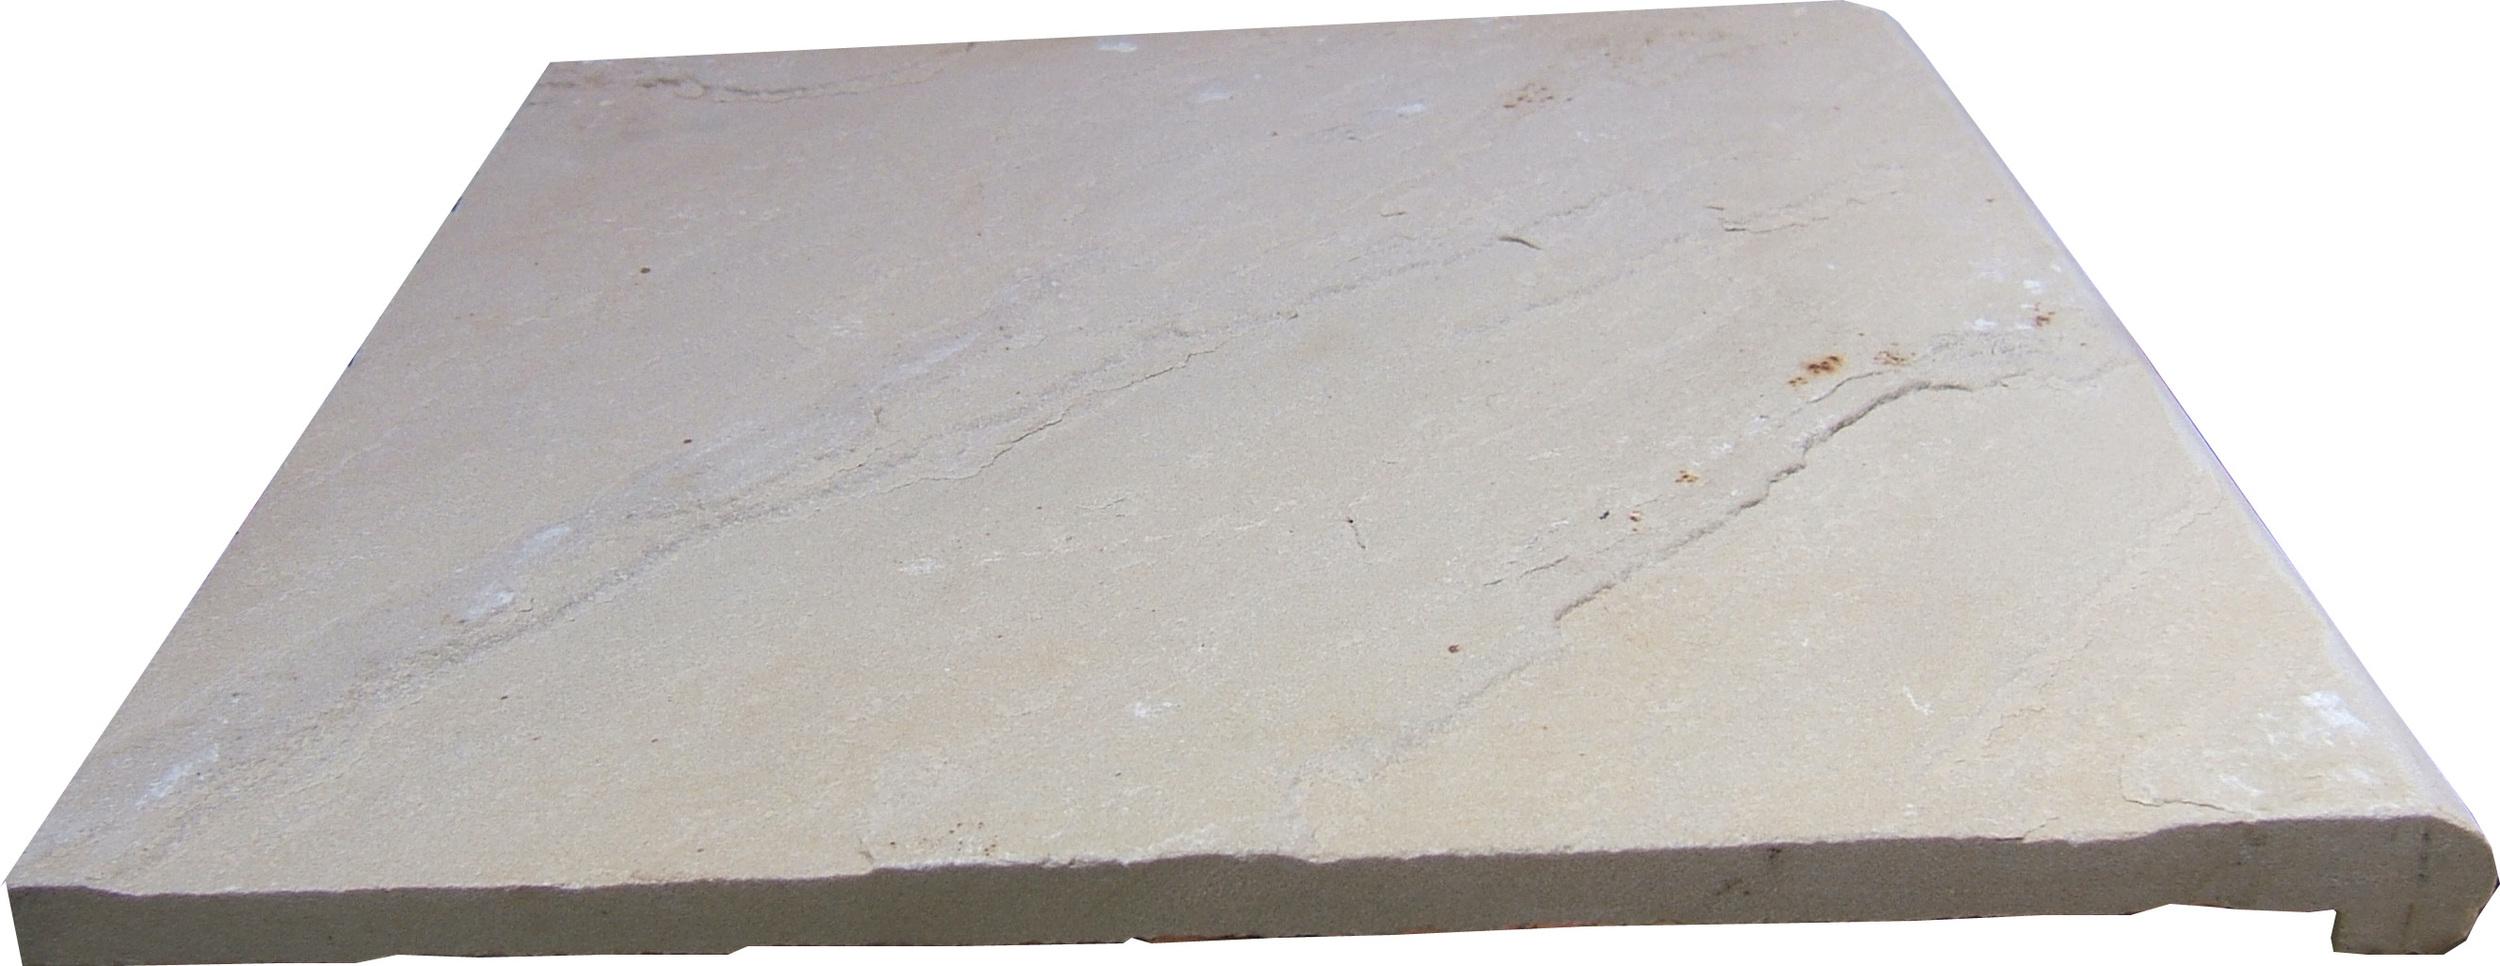 Willow Ledge Tile - 400x400x15/25mm